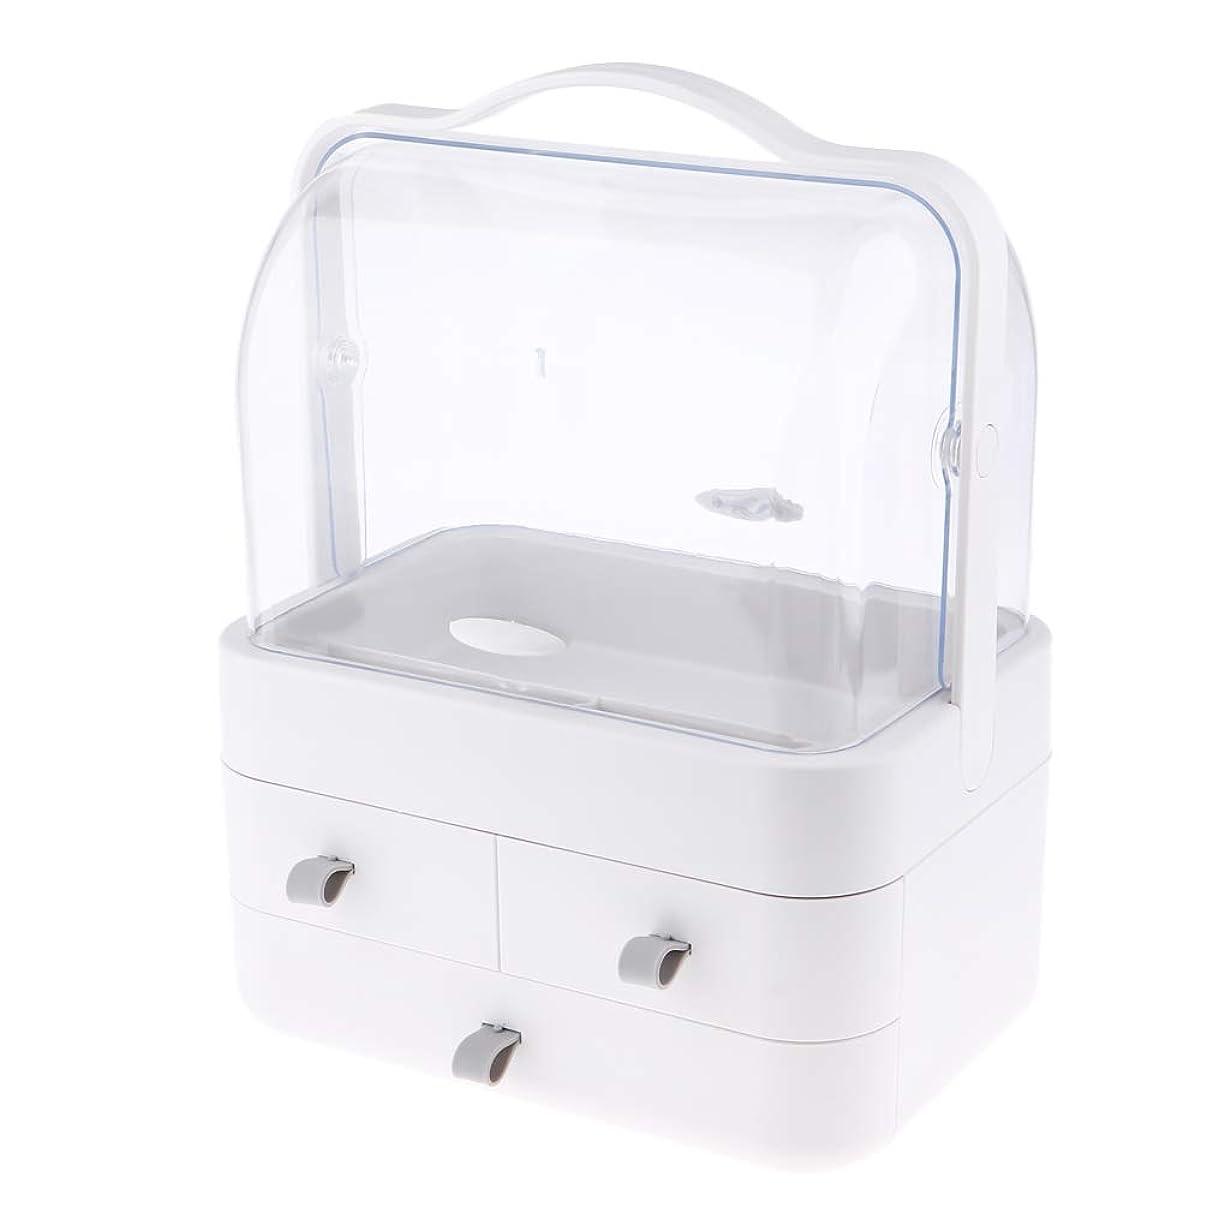 Perfeclan 180度回転 化粧品収納ボックス メイクケース 防水 大容量 3層 引き出し式 卓上収納 全2色 - グレーのひも